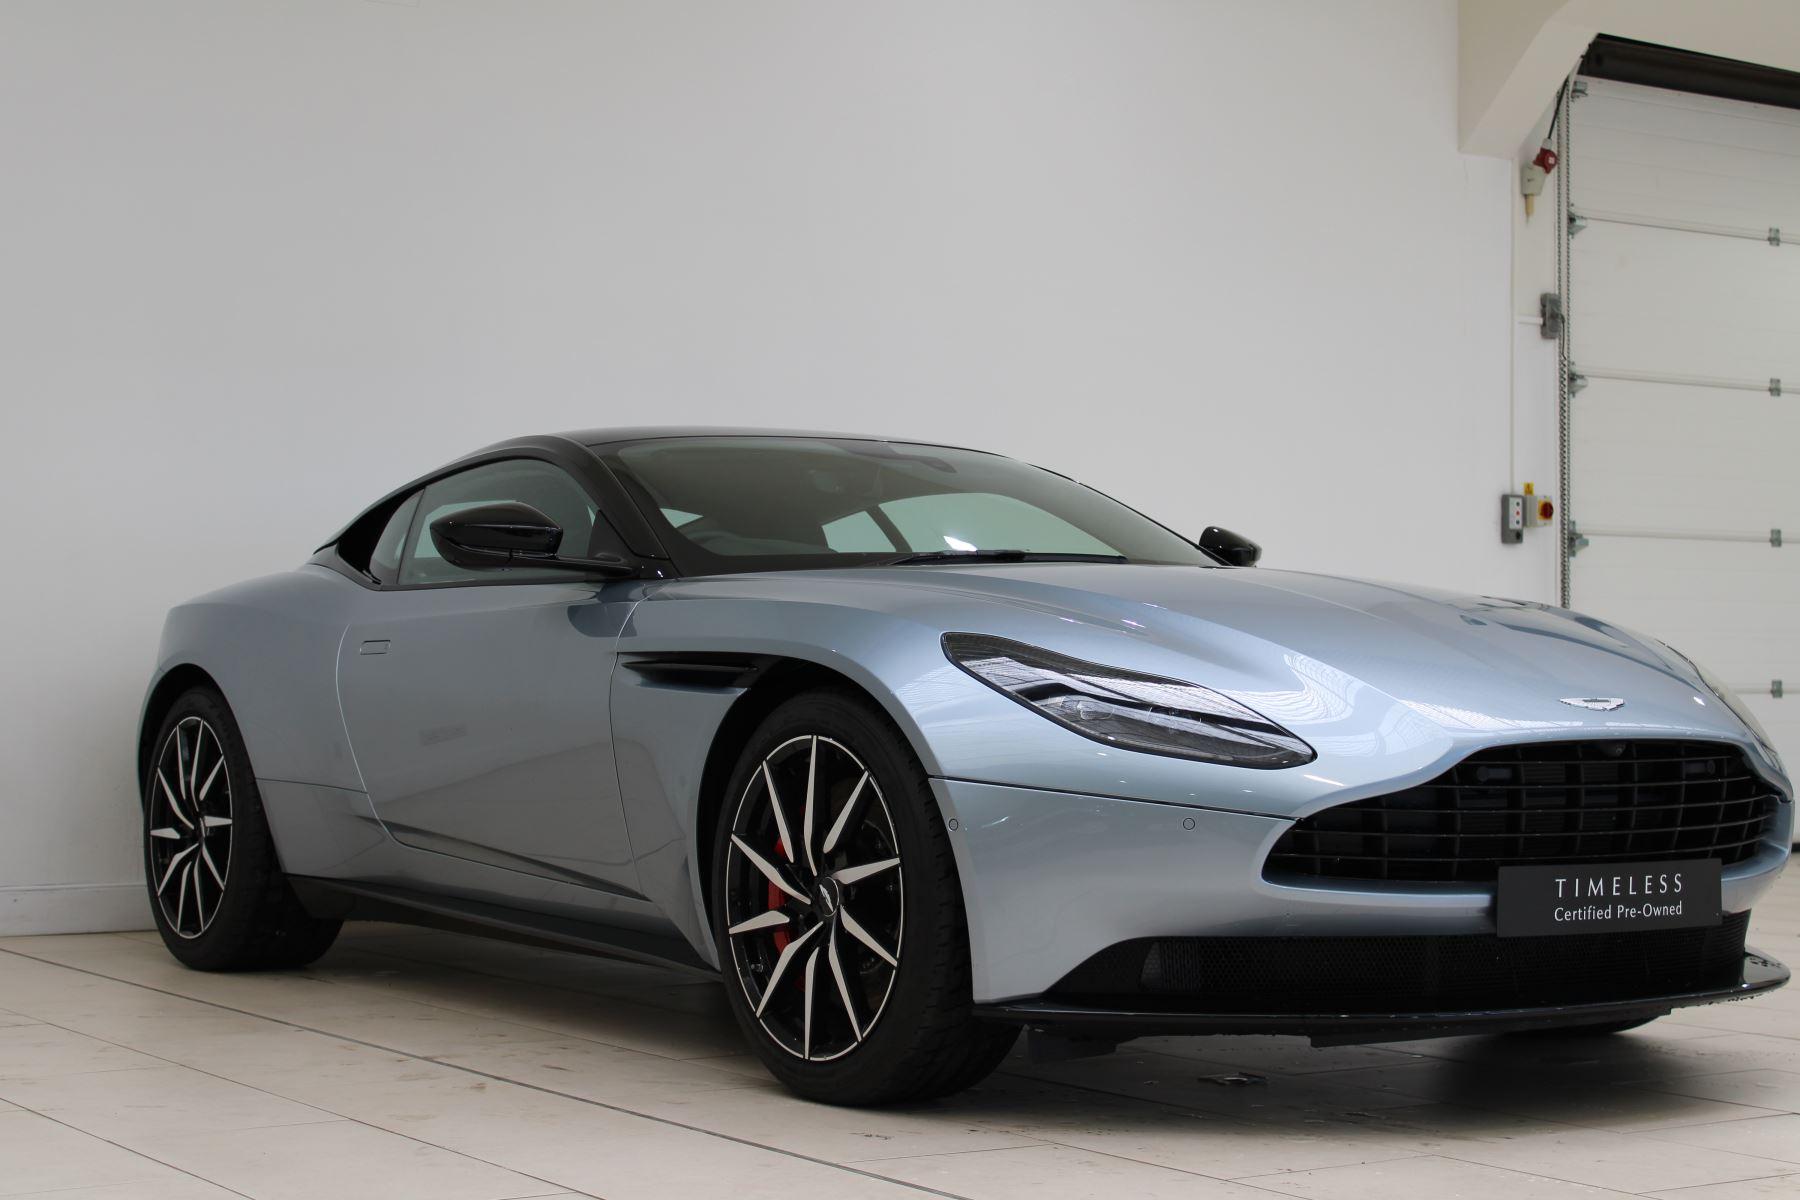 Aston Martin DB11 V8 2dr Touchtronic Auto image 2